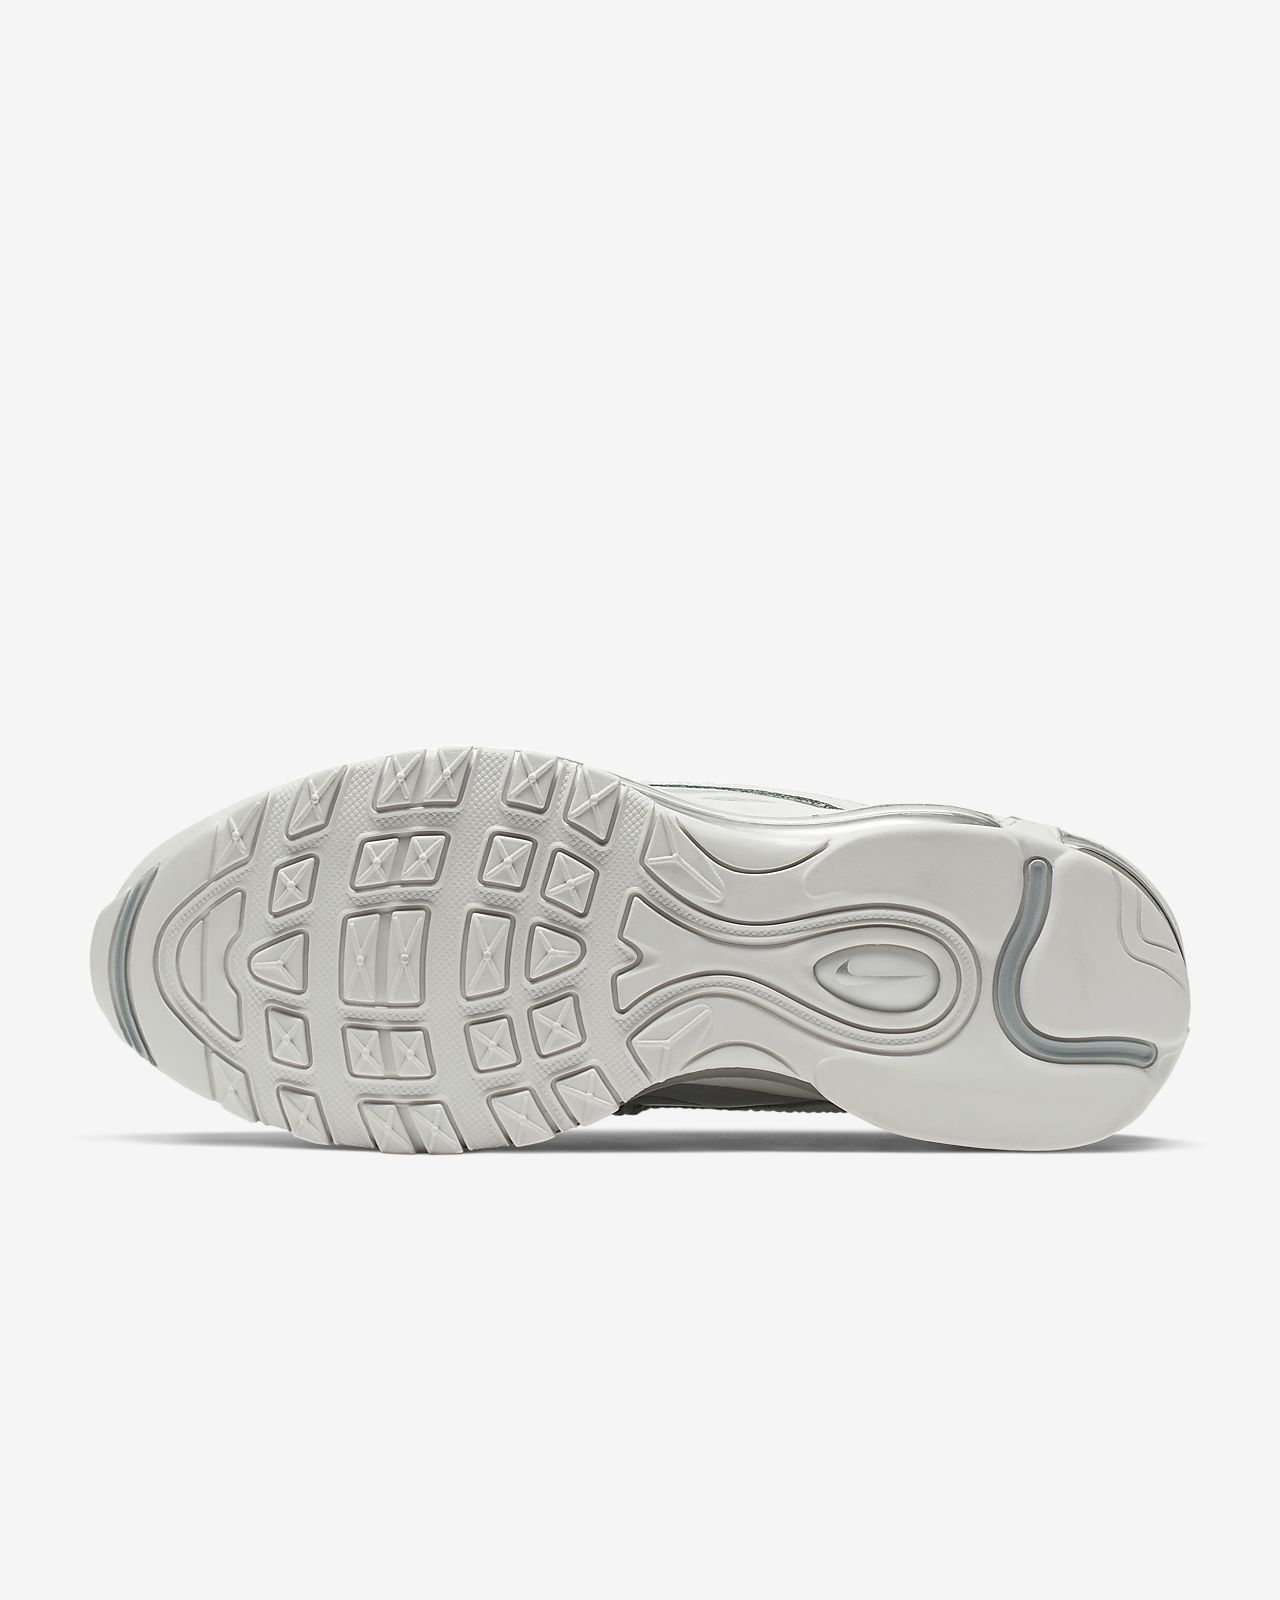 Nike Air Max 97 schimmernder Damenschuh